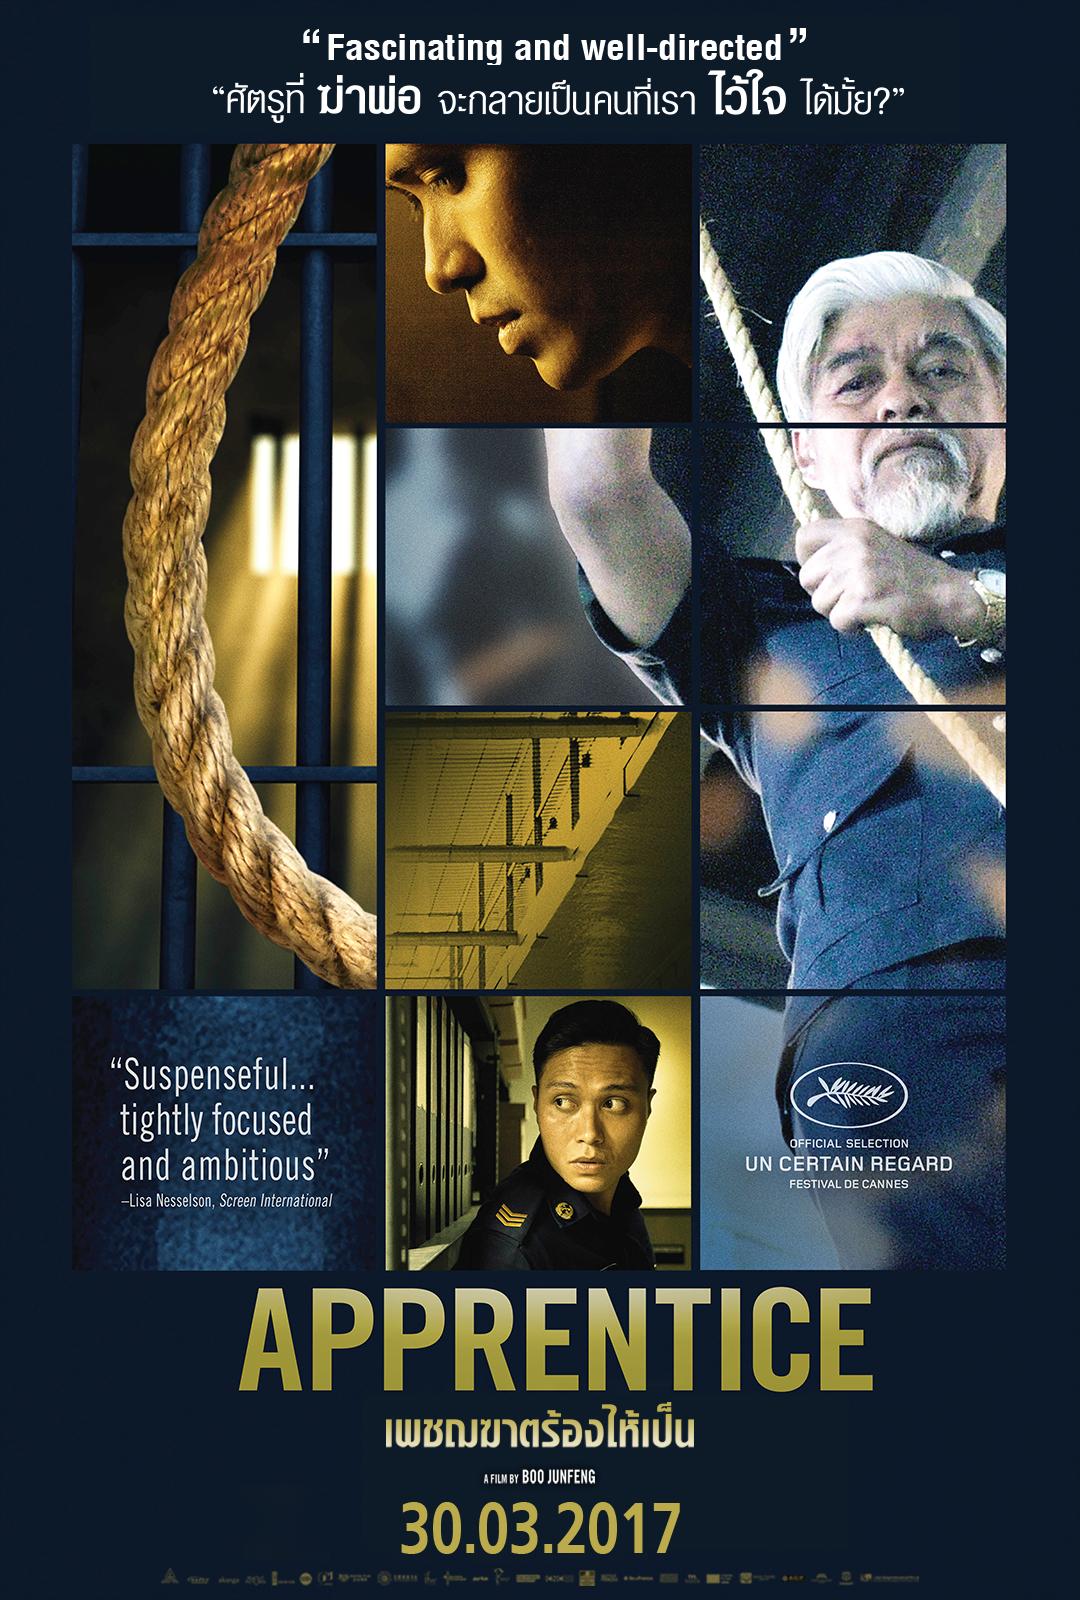 APPRENTICE เพชฌฆาตร้องไห้เป็นภาพยนตร์สิงคโปร์ที่ดีที่สุดในรอบ 10 ปี87 คะแนนจาก เวปหนัง ROTTEN TOMATOESเข้าฉายในสายประกวดเทศกาลภาพยนตร์เมืองคานส์